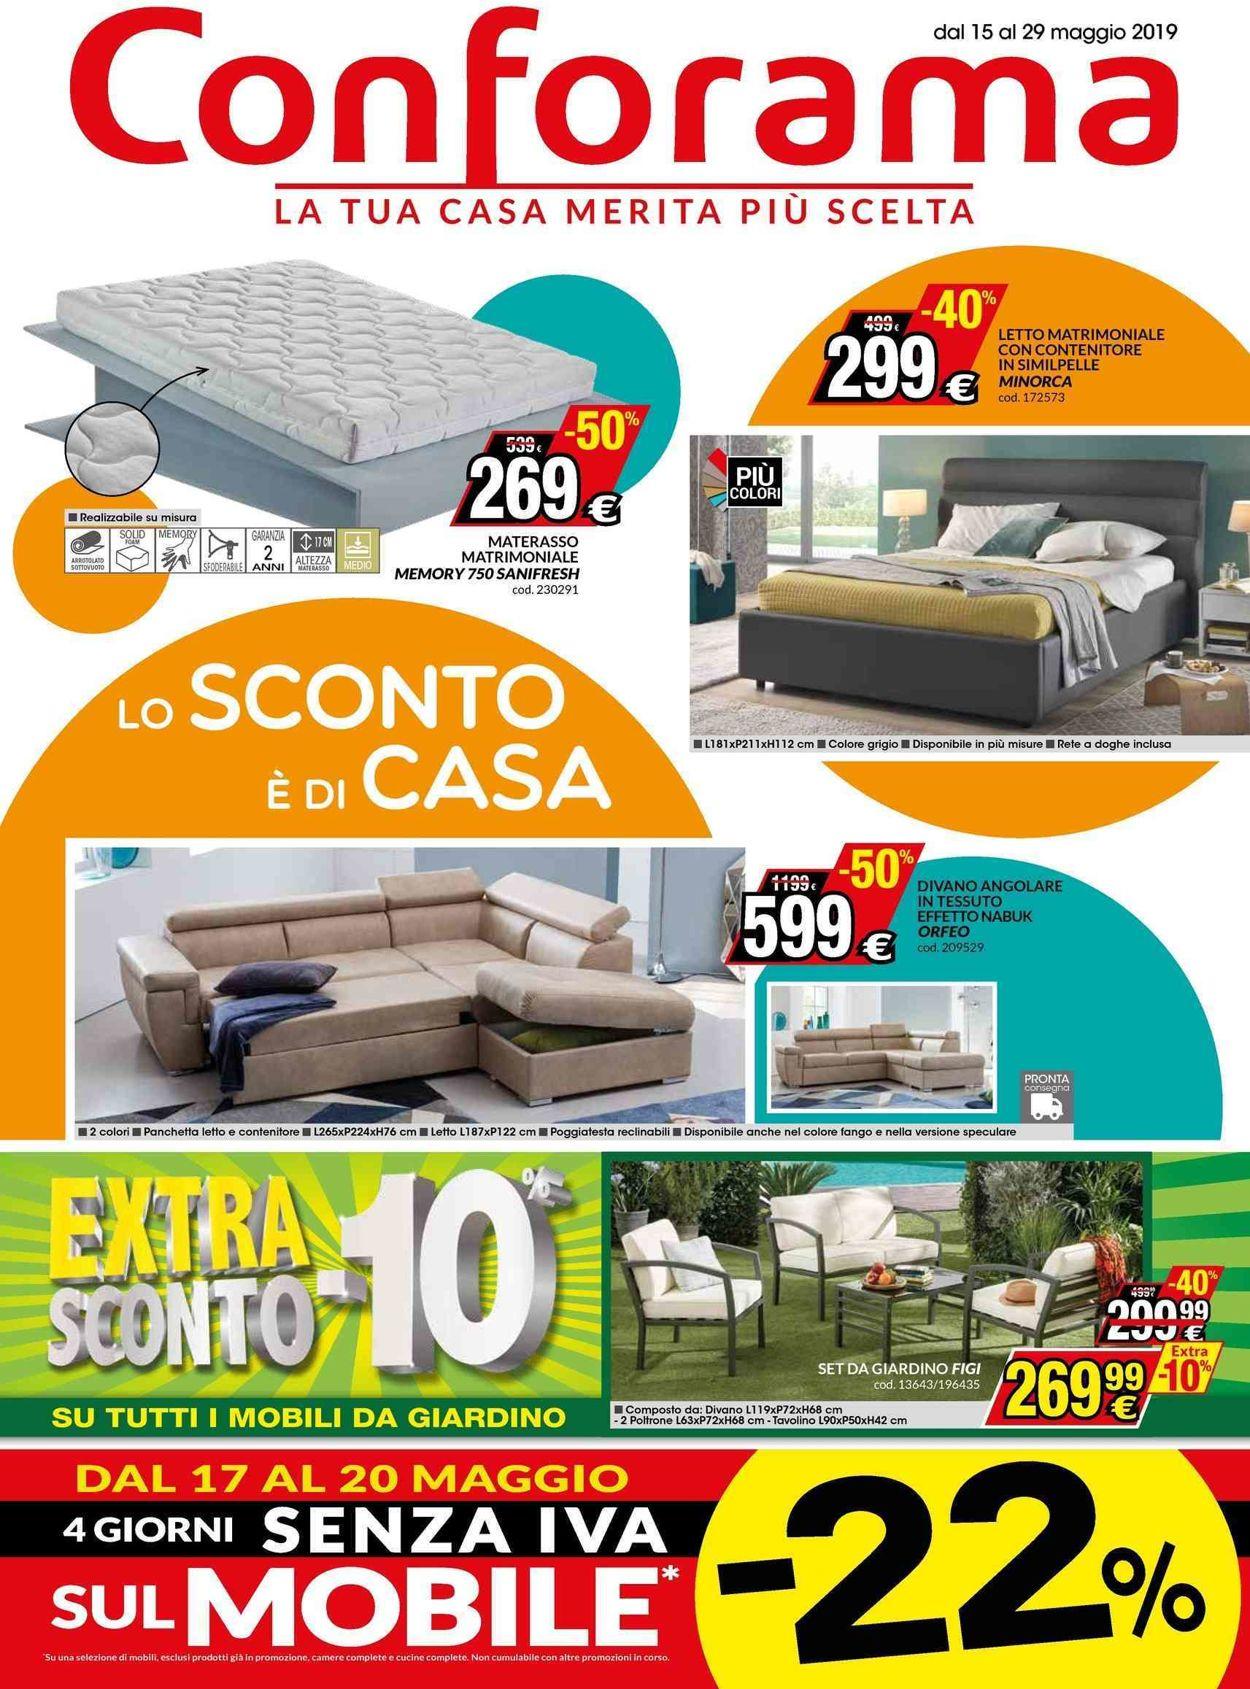 Volantino Conforama - Offerte 15/05-29/05/2019